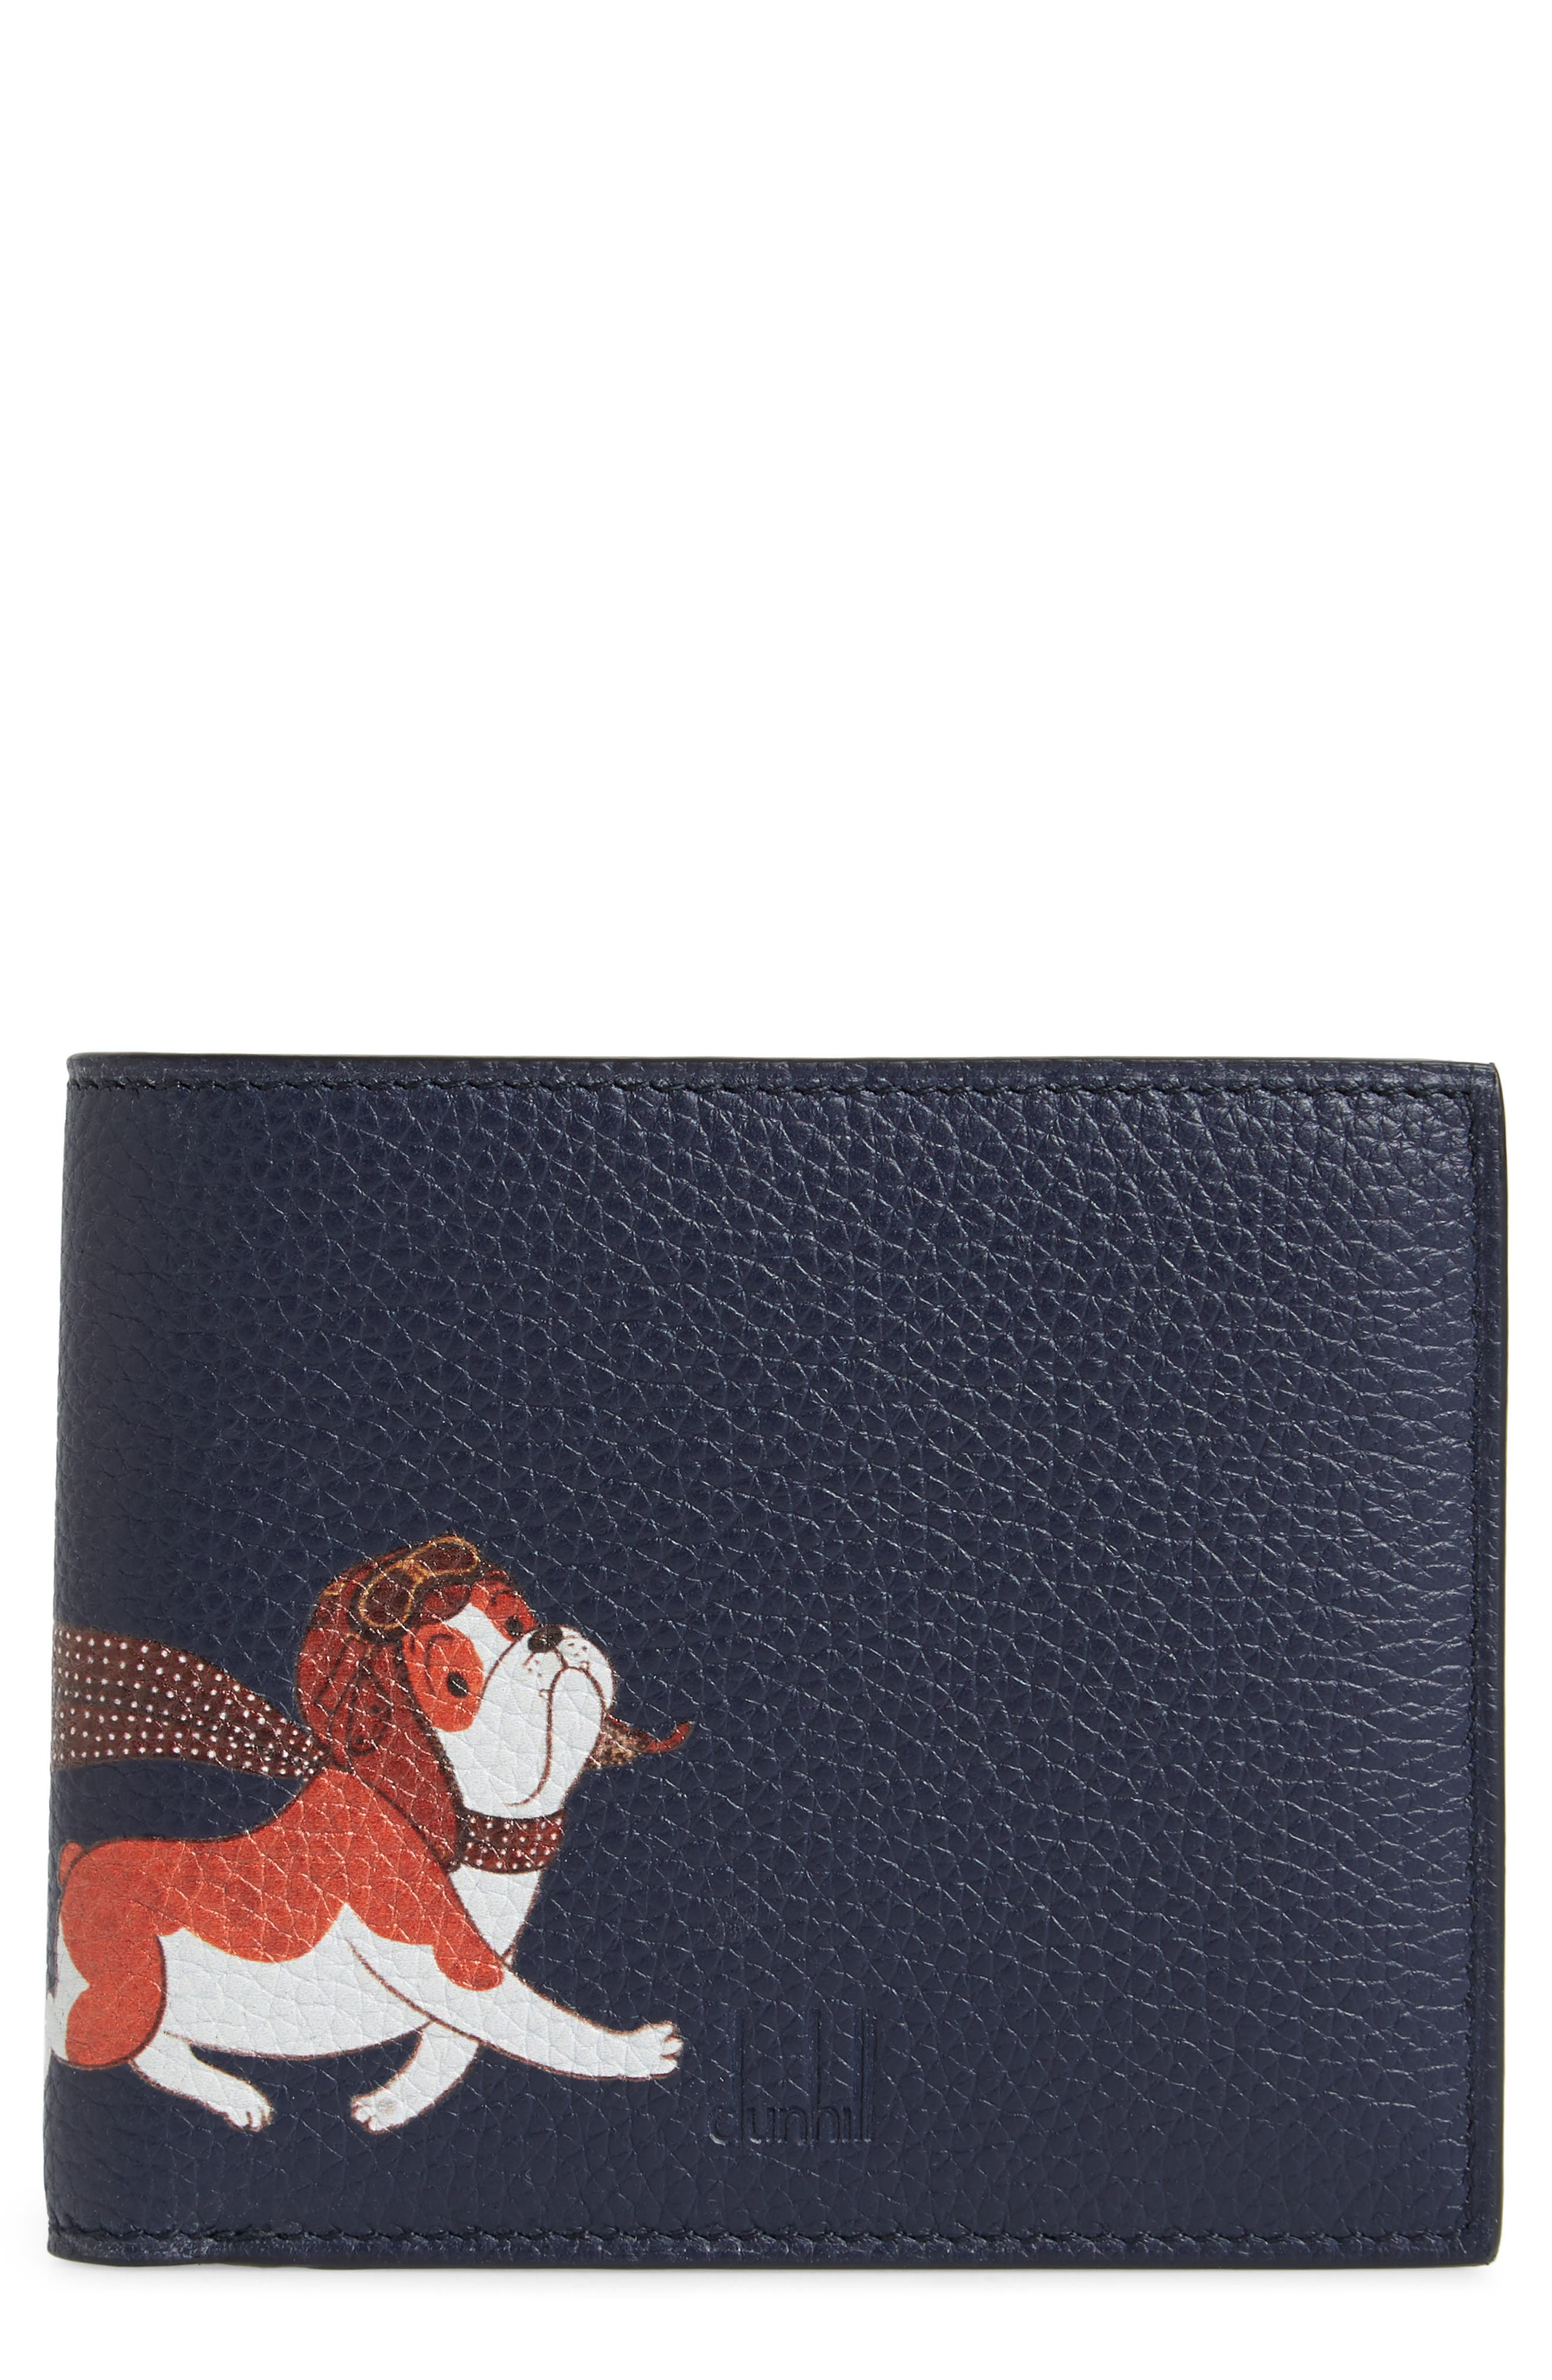 Dunhill Boston Bulldog Leather Bifold Wallet